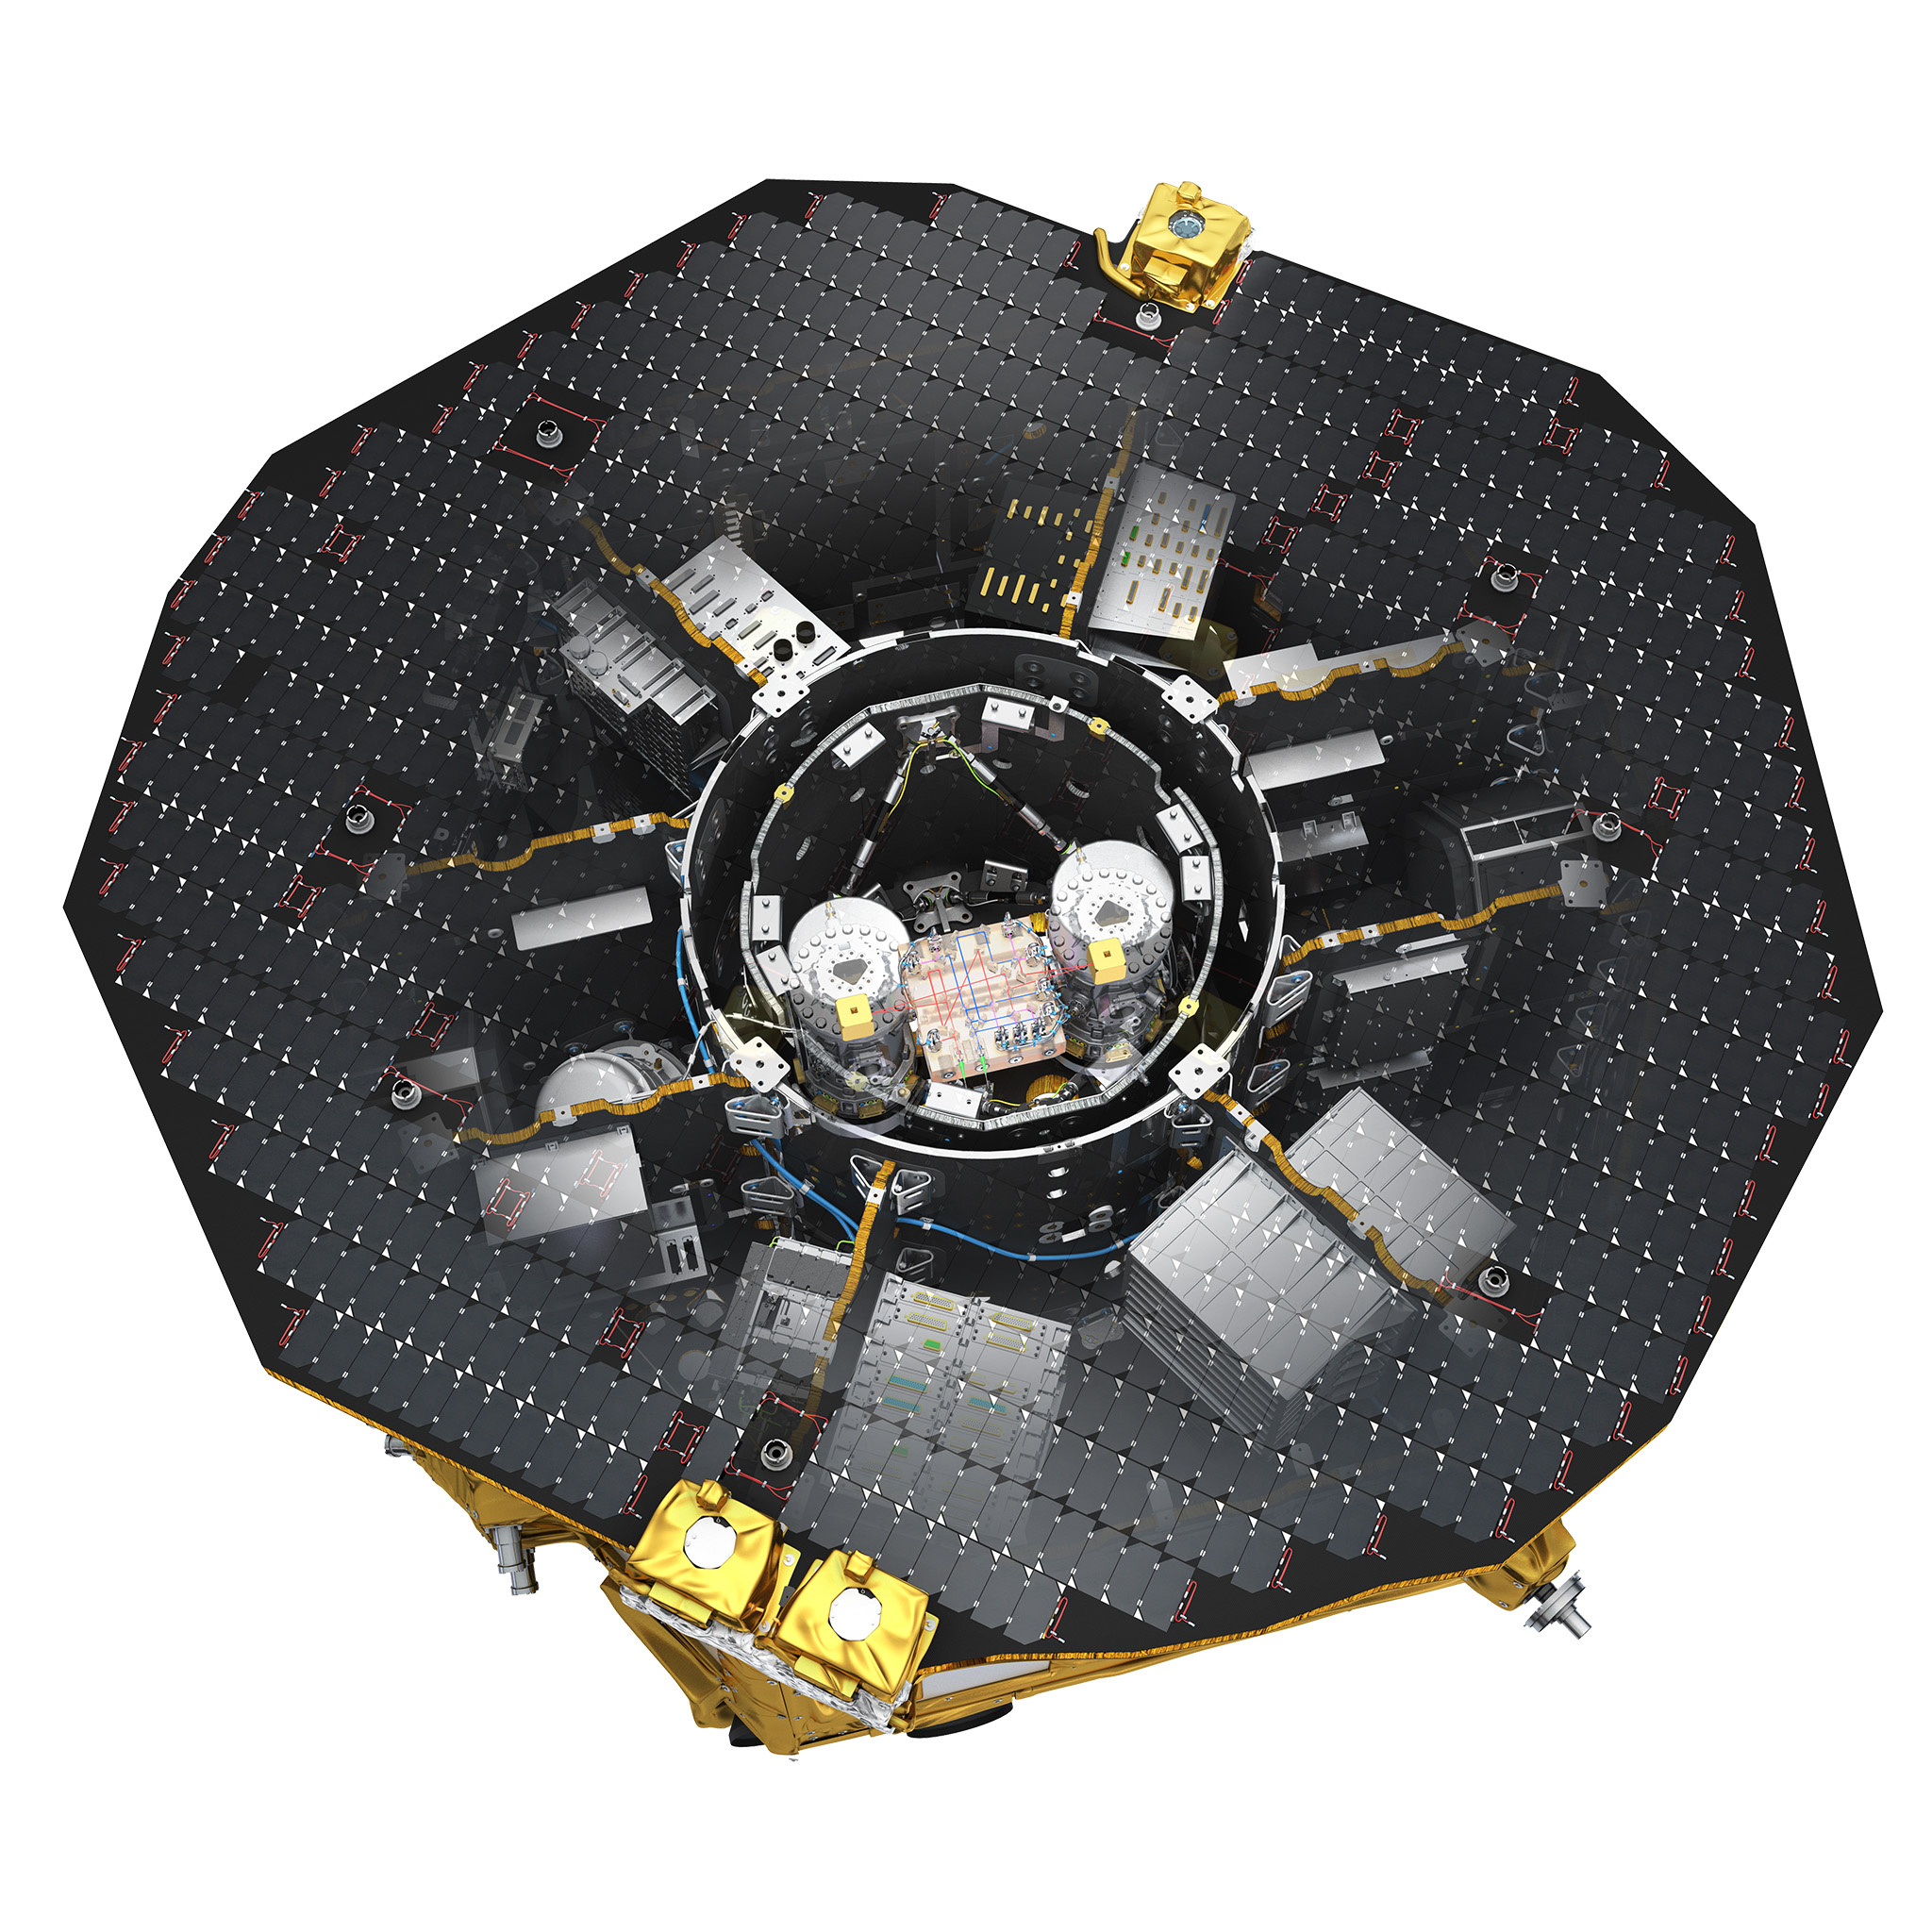 1567215927667-ESA_LISA_Pathfinder_SpacecraftTransparent_view3_2k.jpg